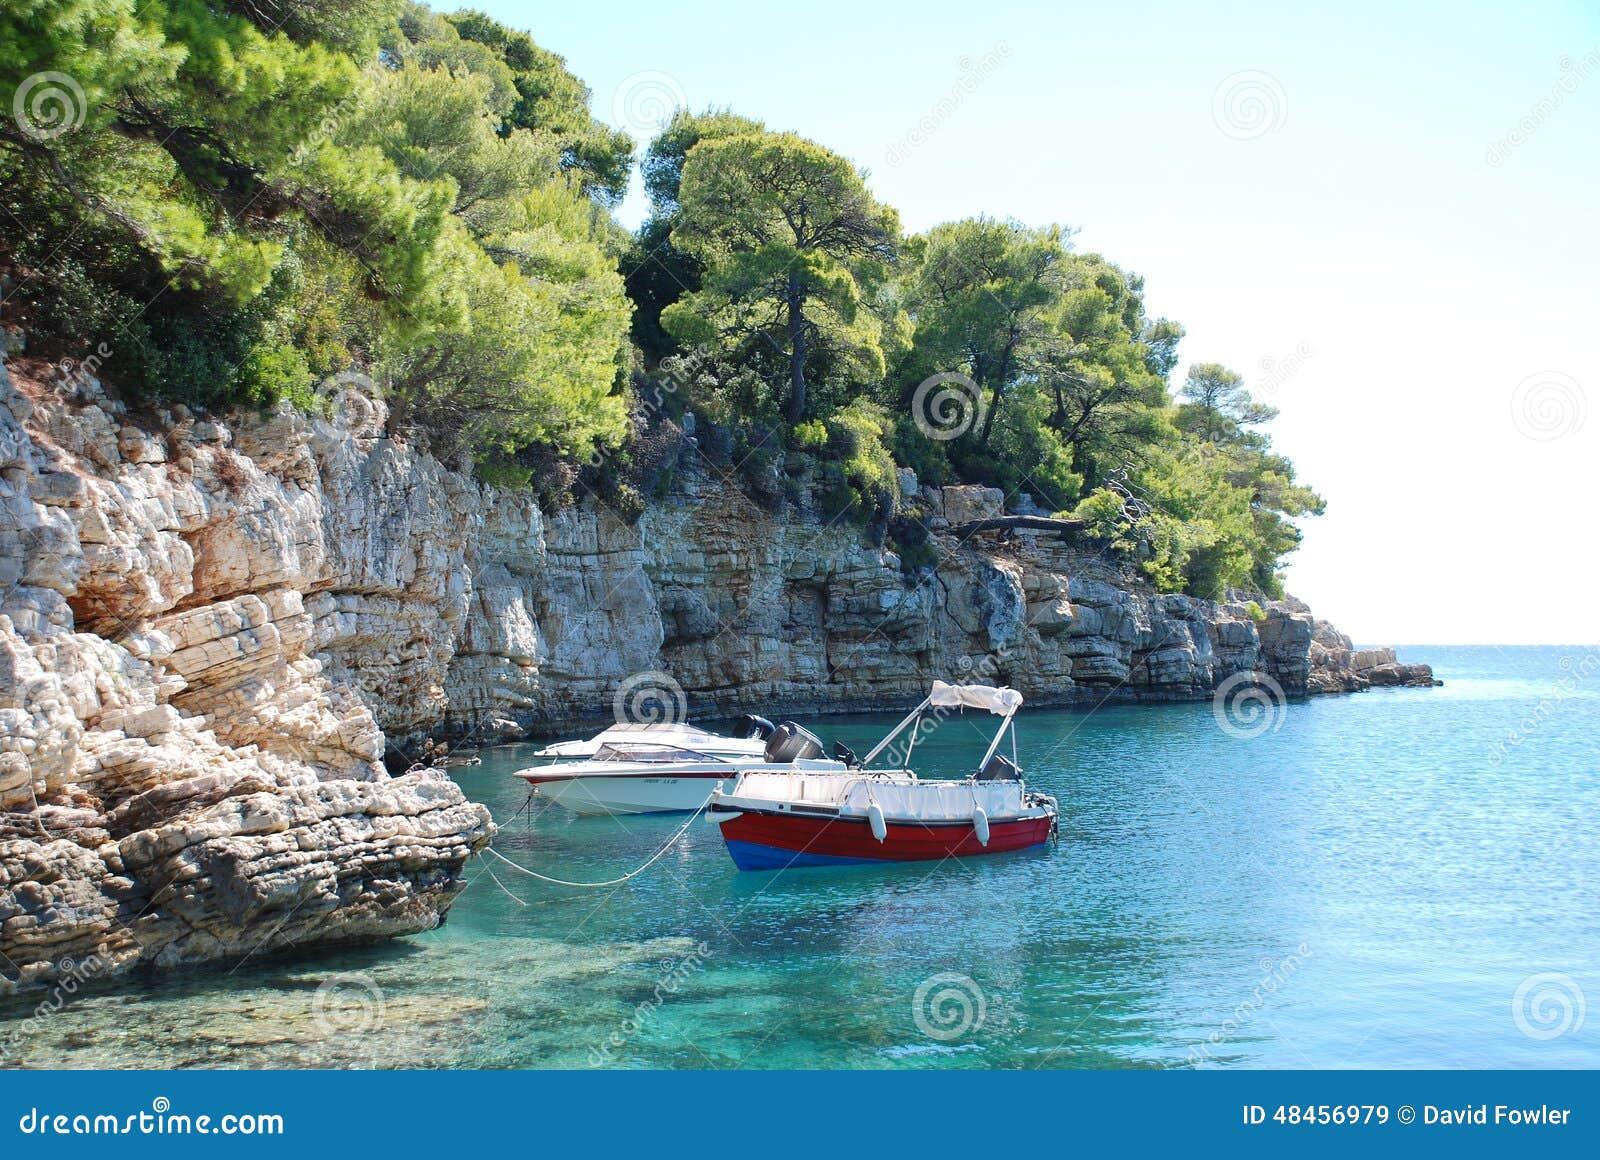 Rousoum-Bucht, Alonissos